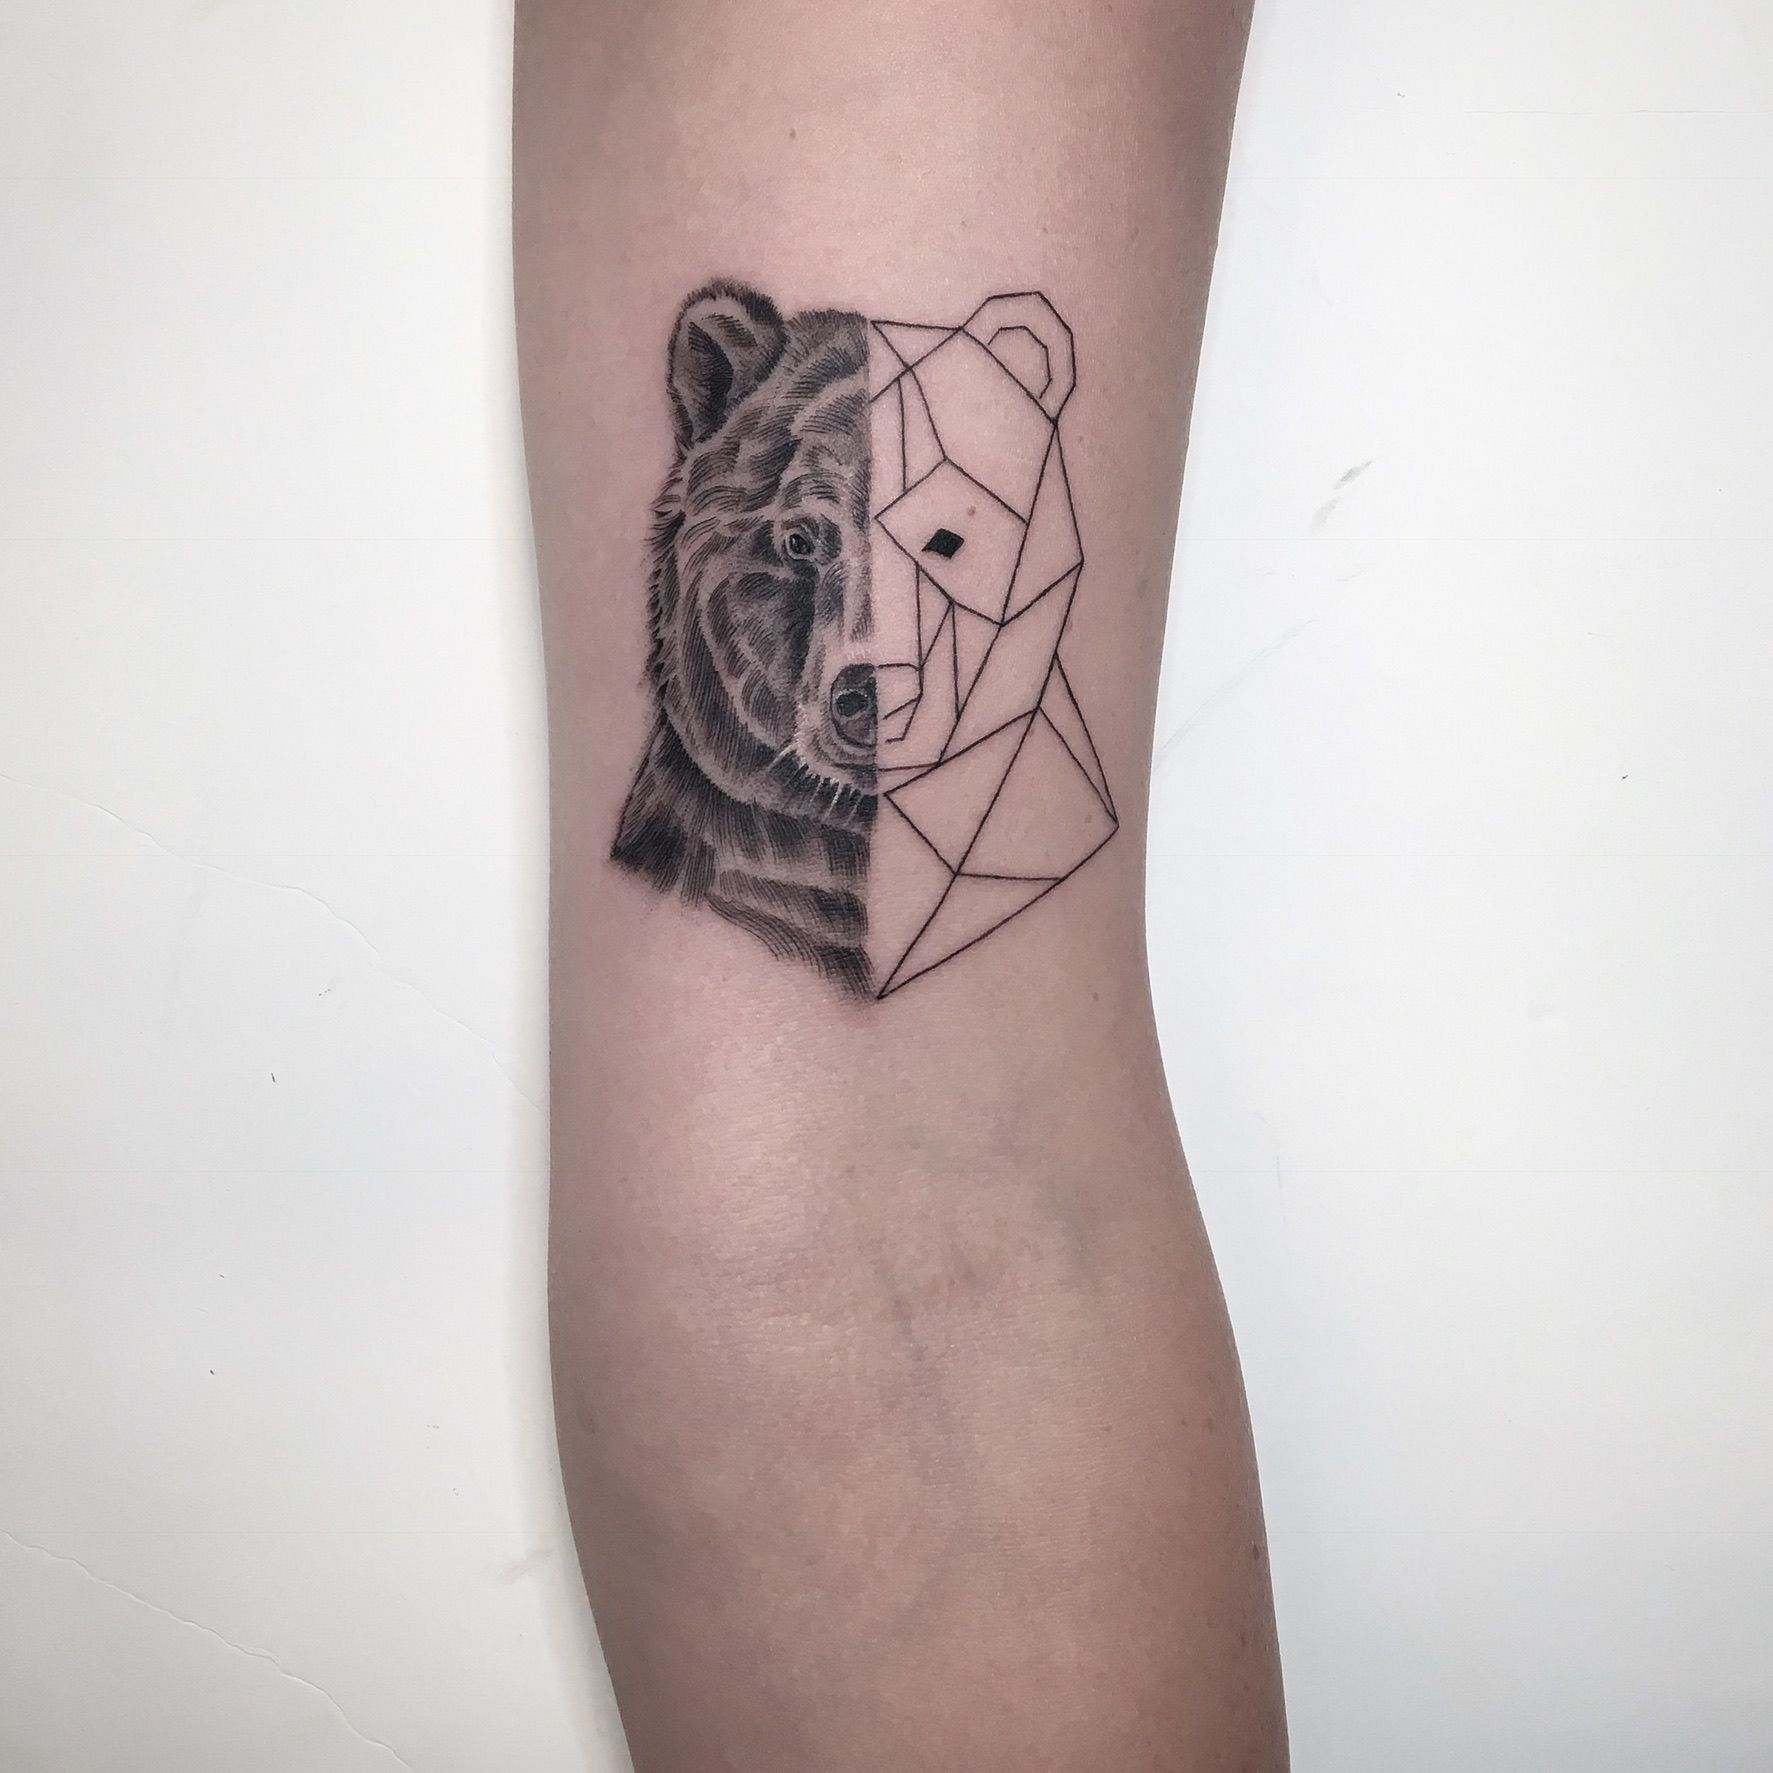 Dcmtattoos Singleneedle Fineline Tattoo Dcmtattoos Geometrictattoo Bear Beartattoo Single Needle Tattoo Tattoos Geometric Tattoo